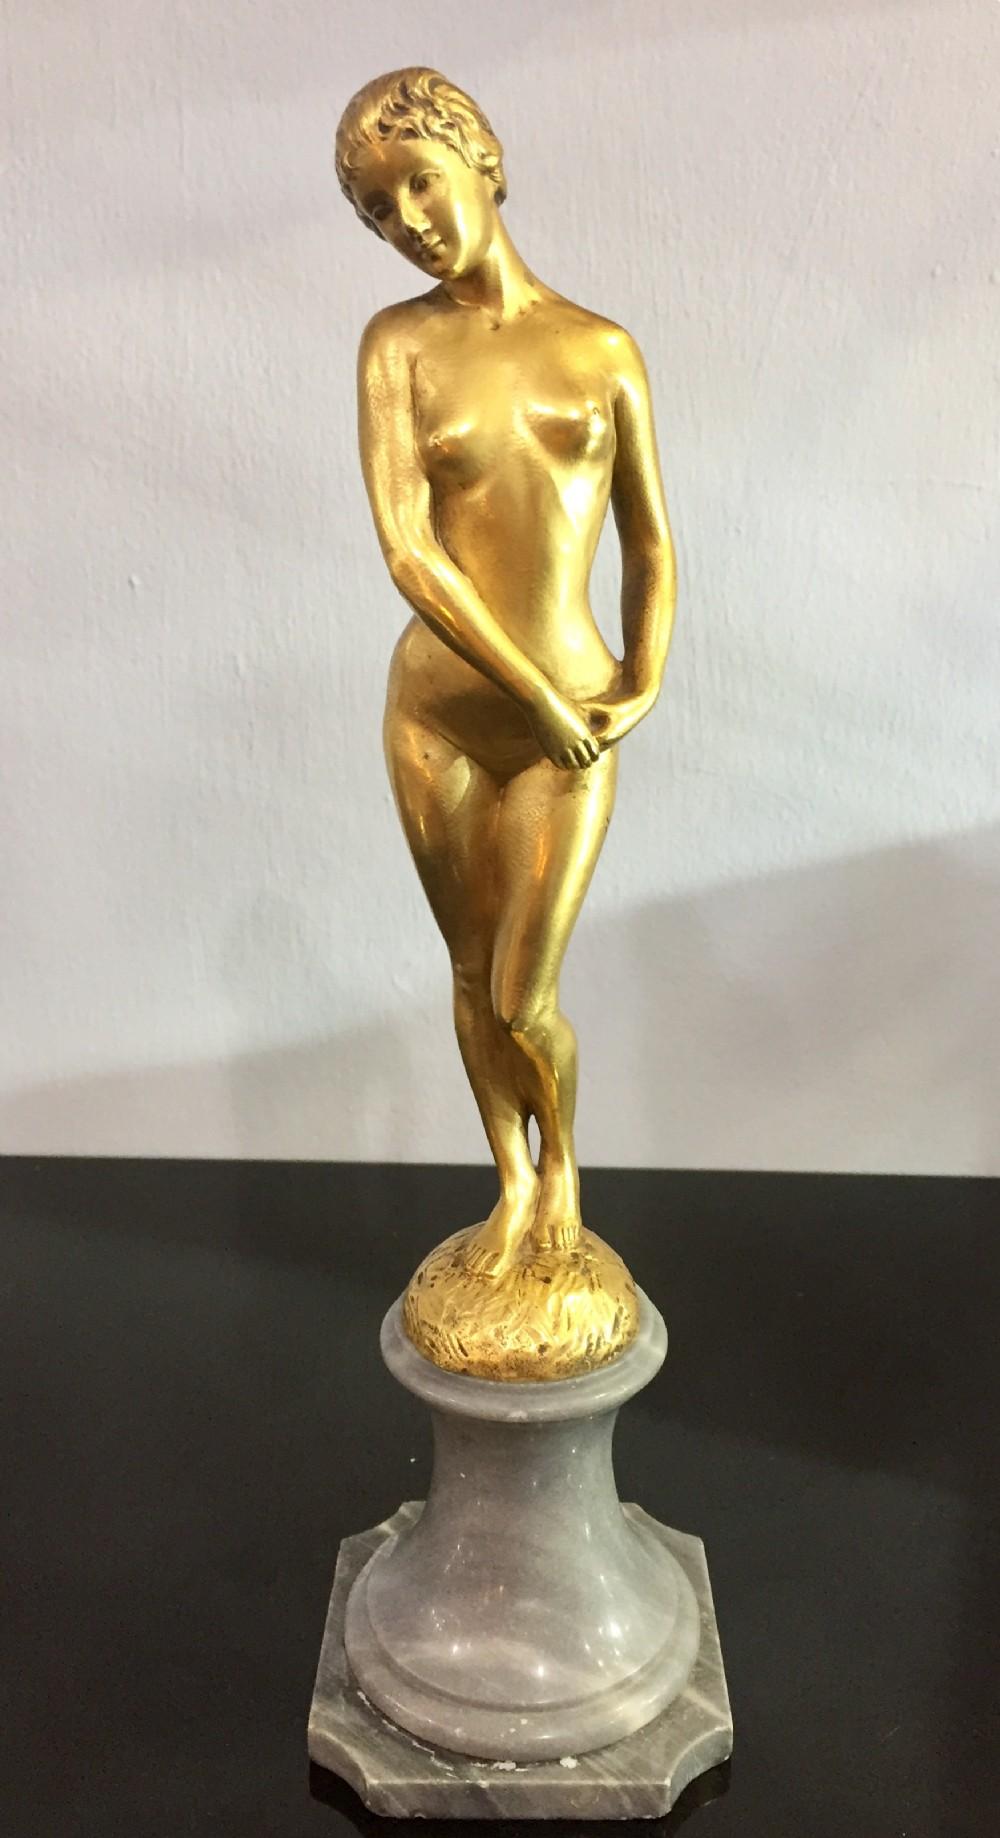 descomps modesty french art nouveau nude female bronze c1900